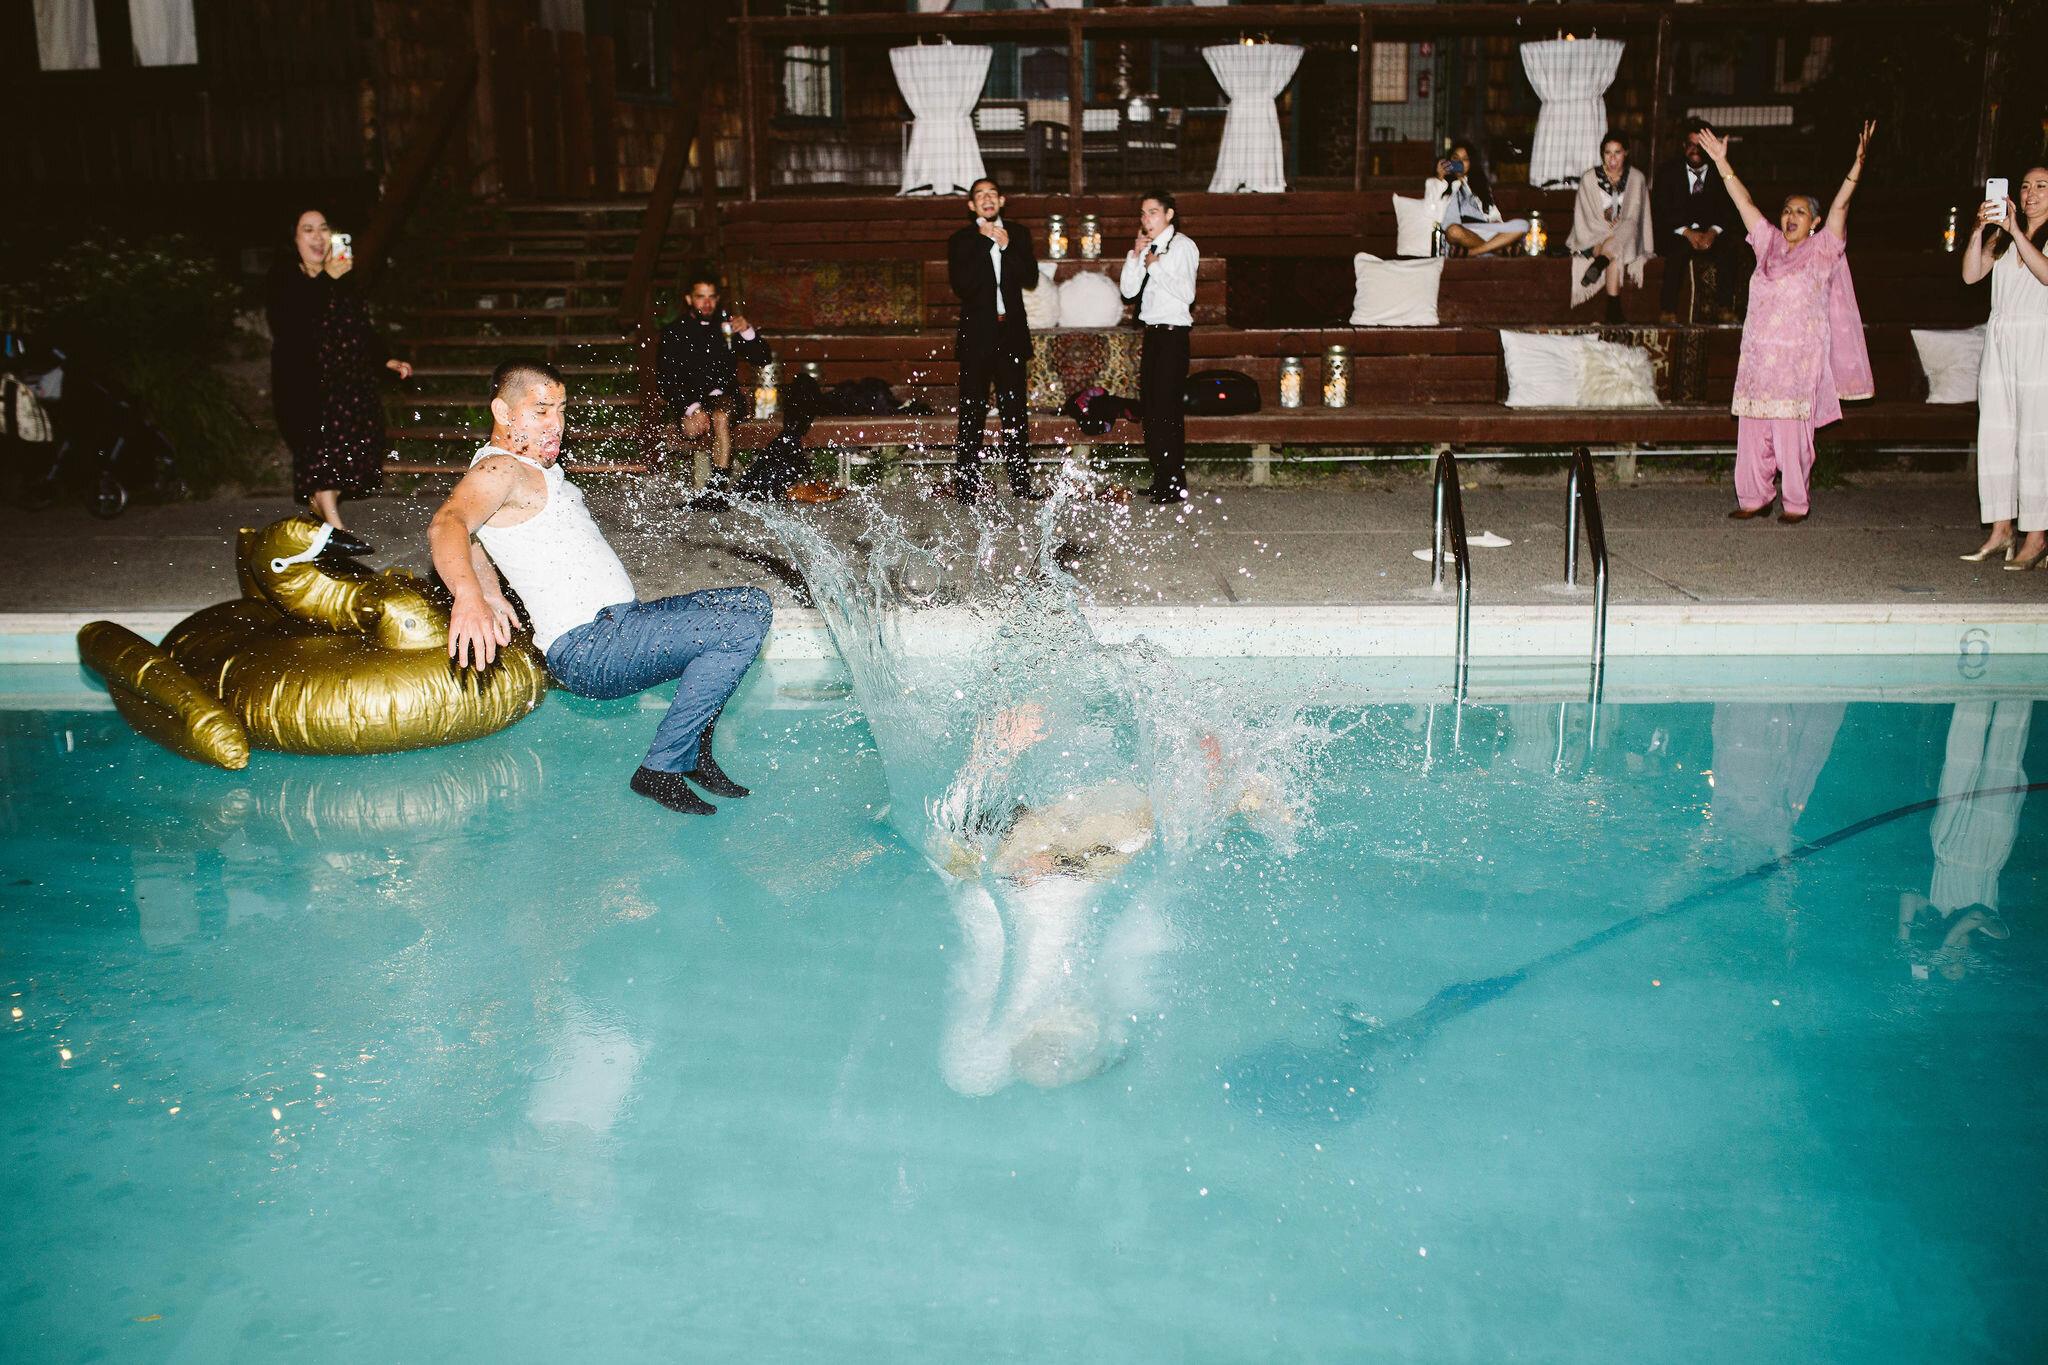 Venture-Retreat-Center-Wedding-Pescadero-Sat-Aaron-Pritam-The-Shalom-Imaginative-967.jpg